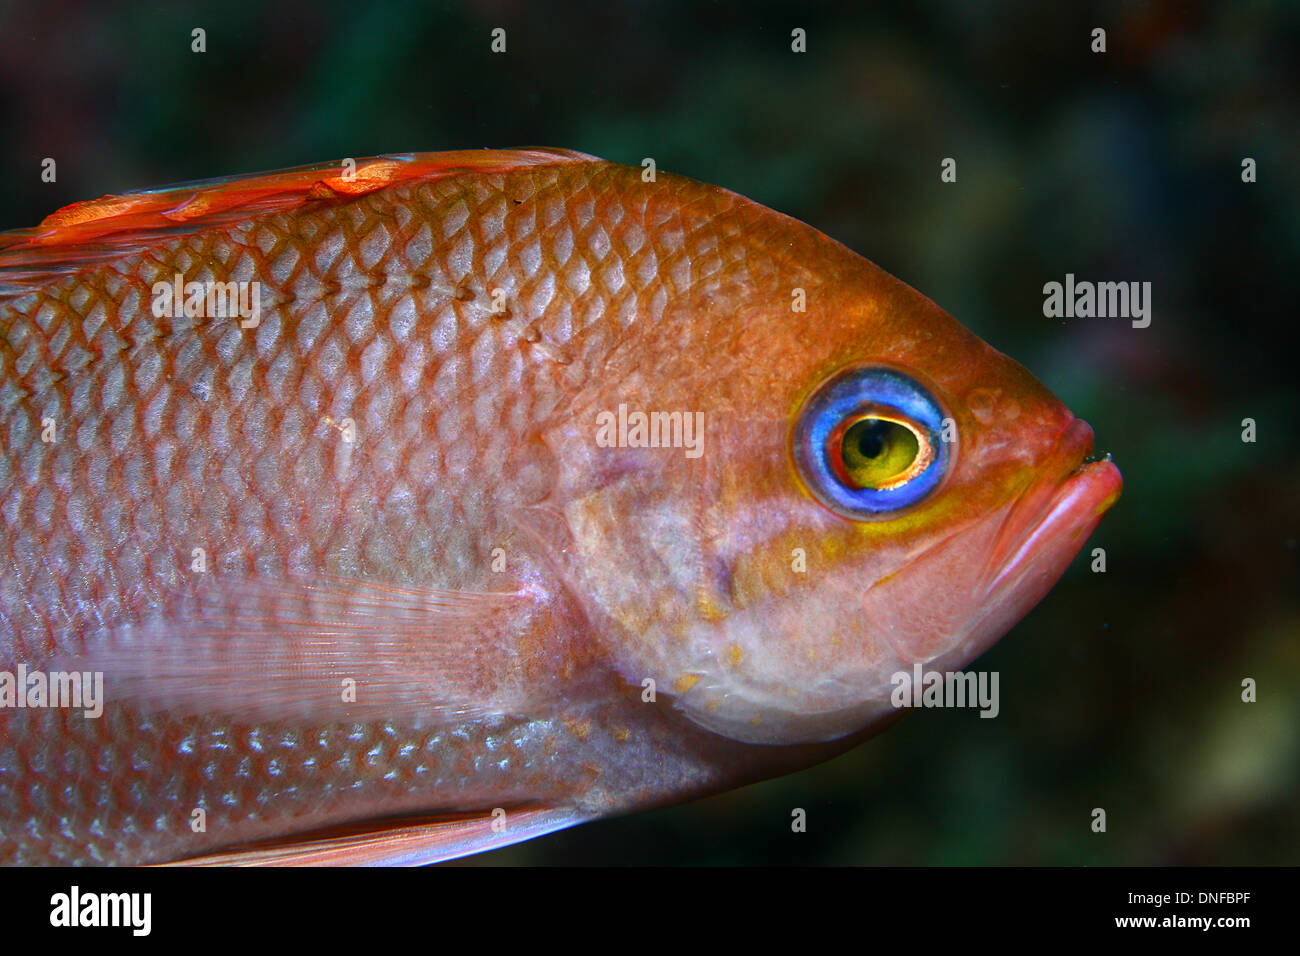 Anthias is a beautiful fish of mediterranean sea - Stock Image